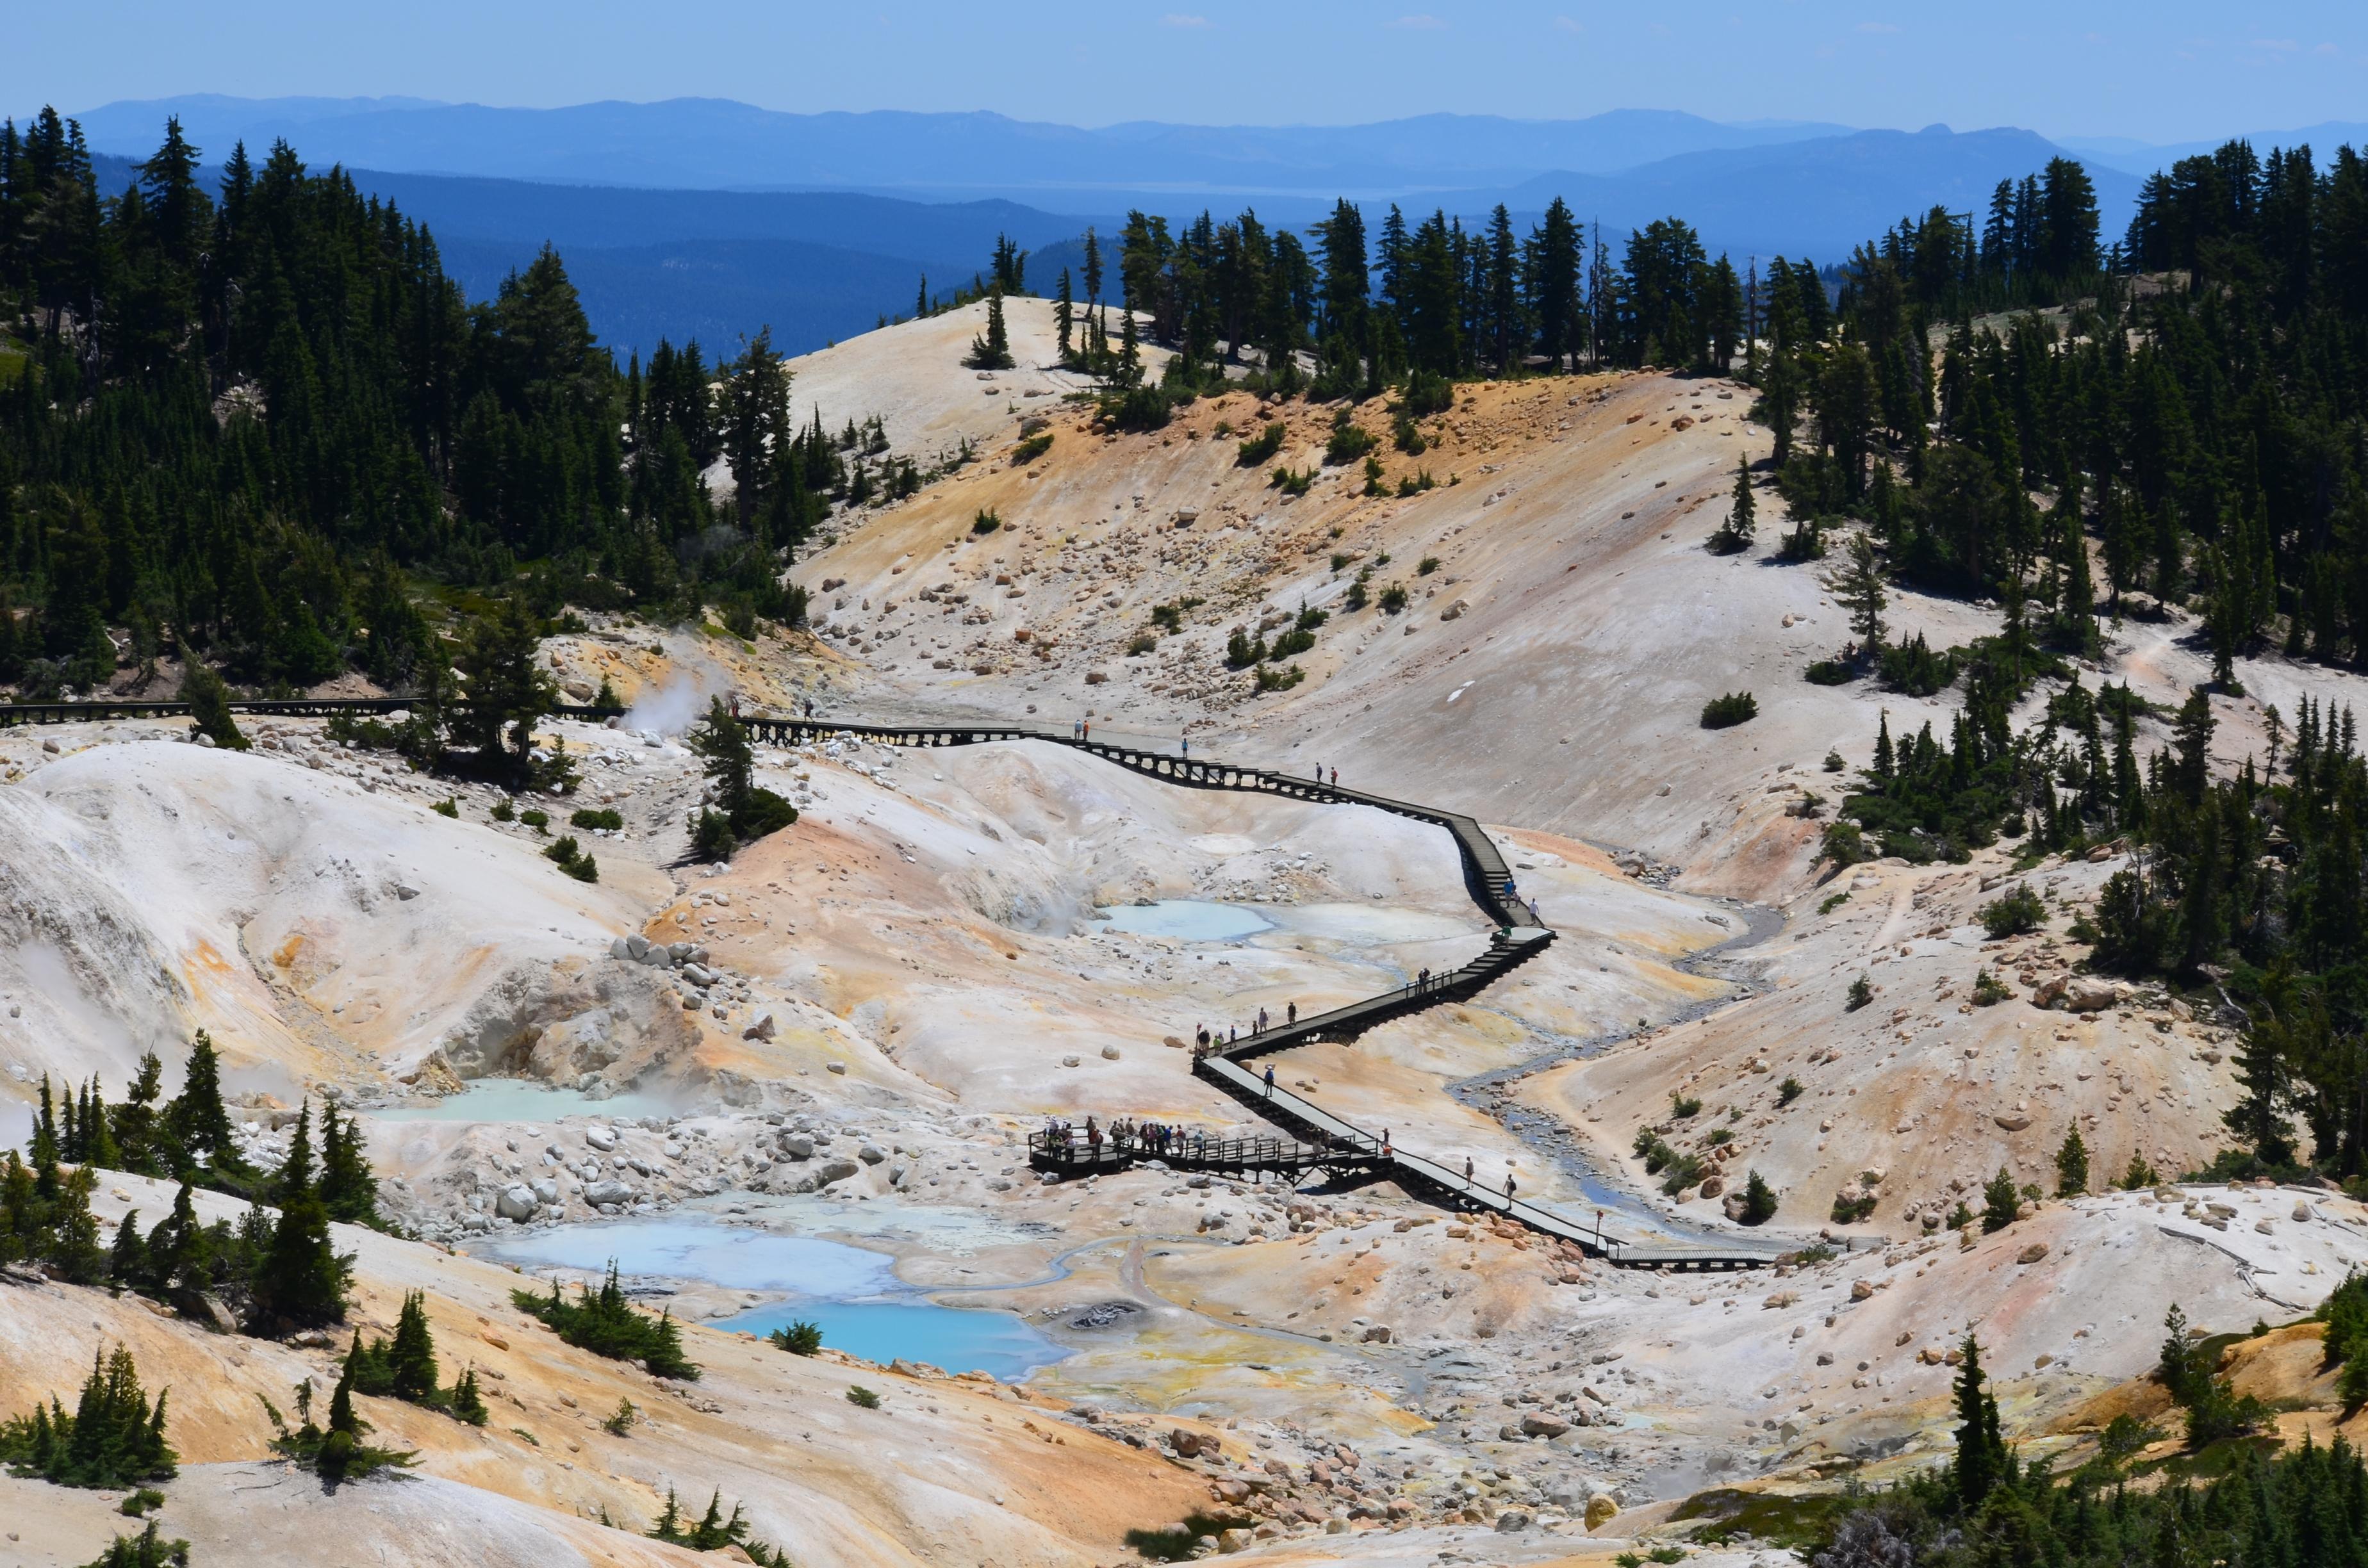 Lassen Volcanic National Park Looking for Input on Bumpass ...